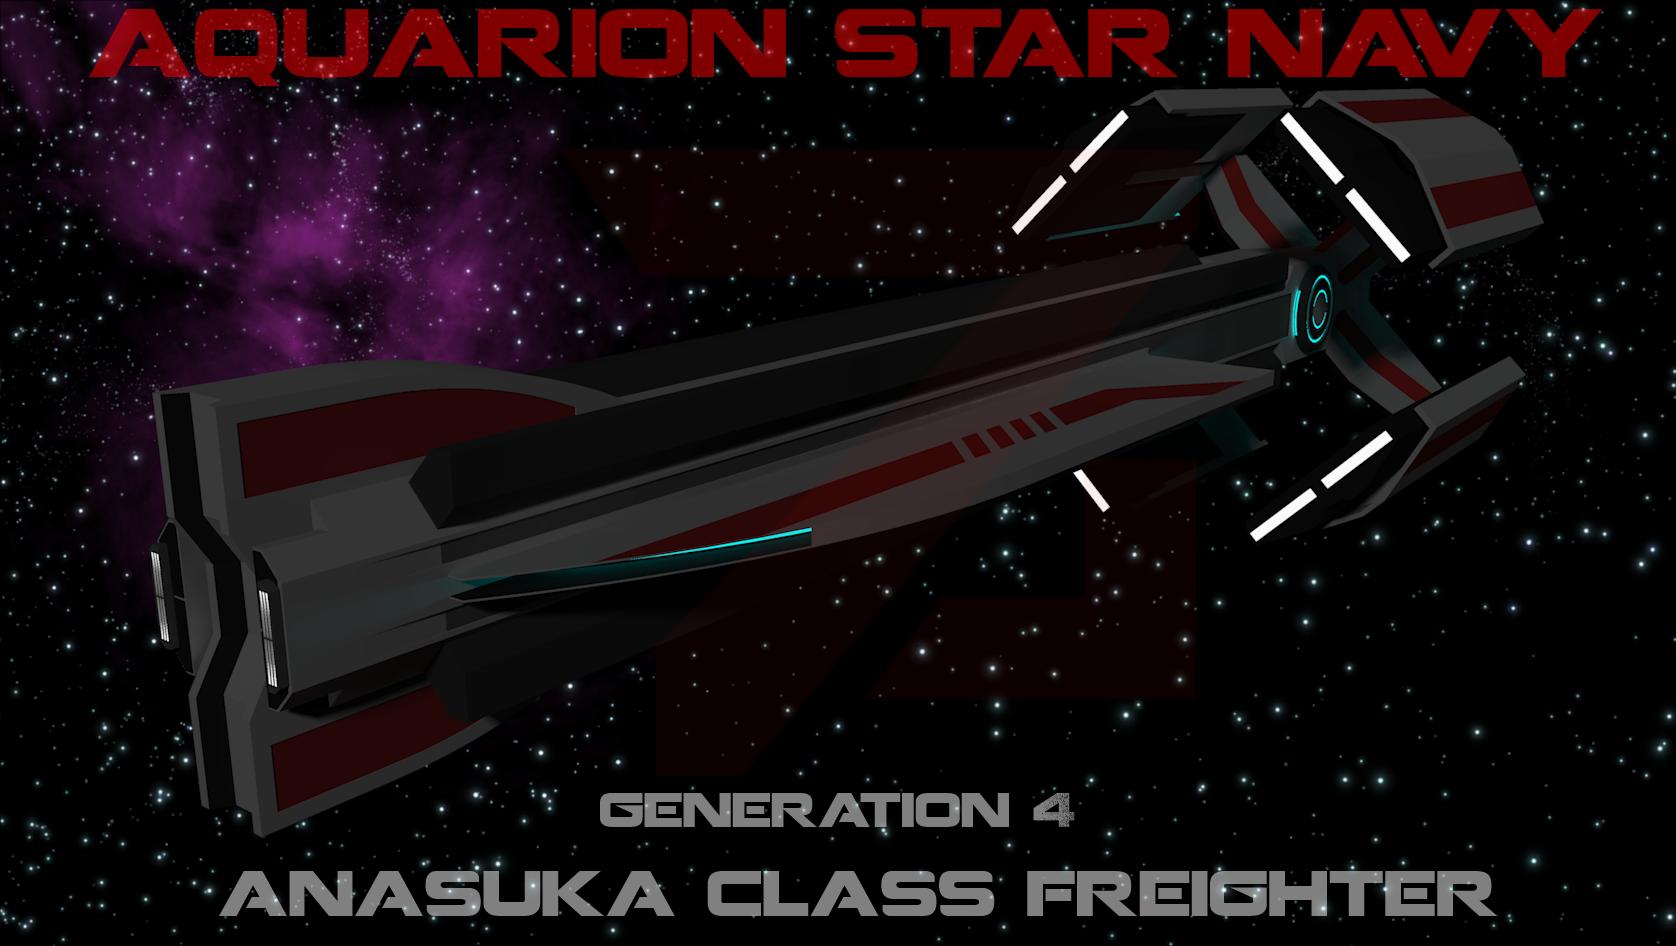 Anasuka Class Freighter [Aquarions] by Gwentari